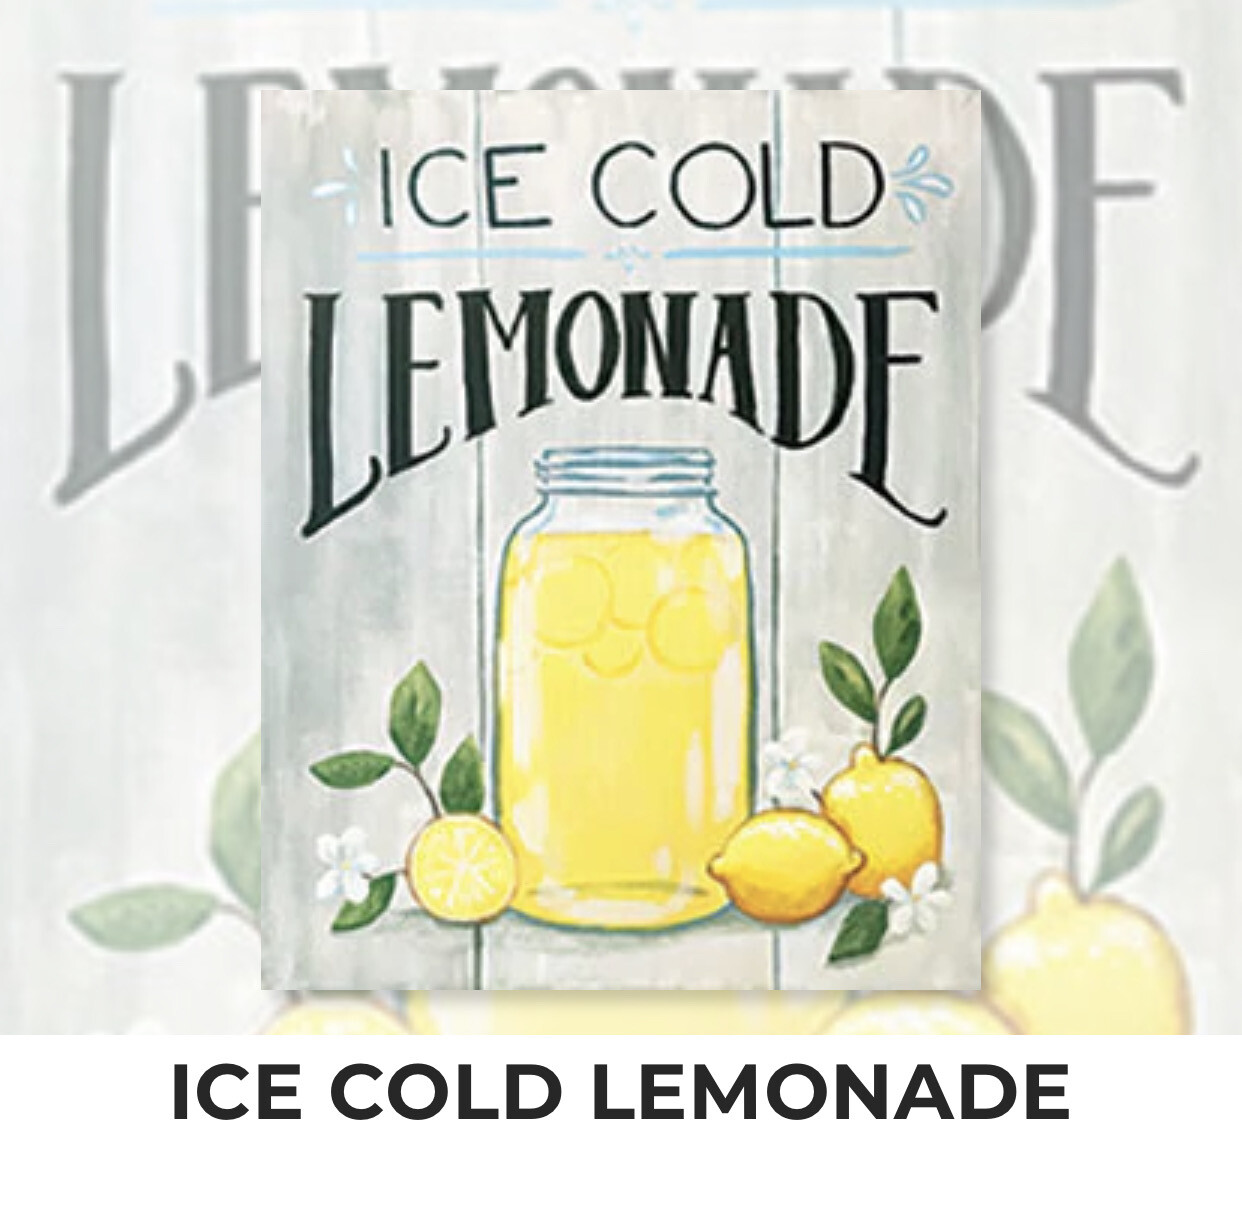 Ice Cold Lemonade ADULT Acrylic Paint On Canvas DIY Art Kit - 3 Week Special Order